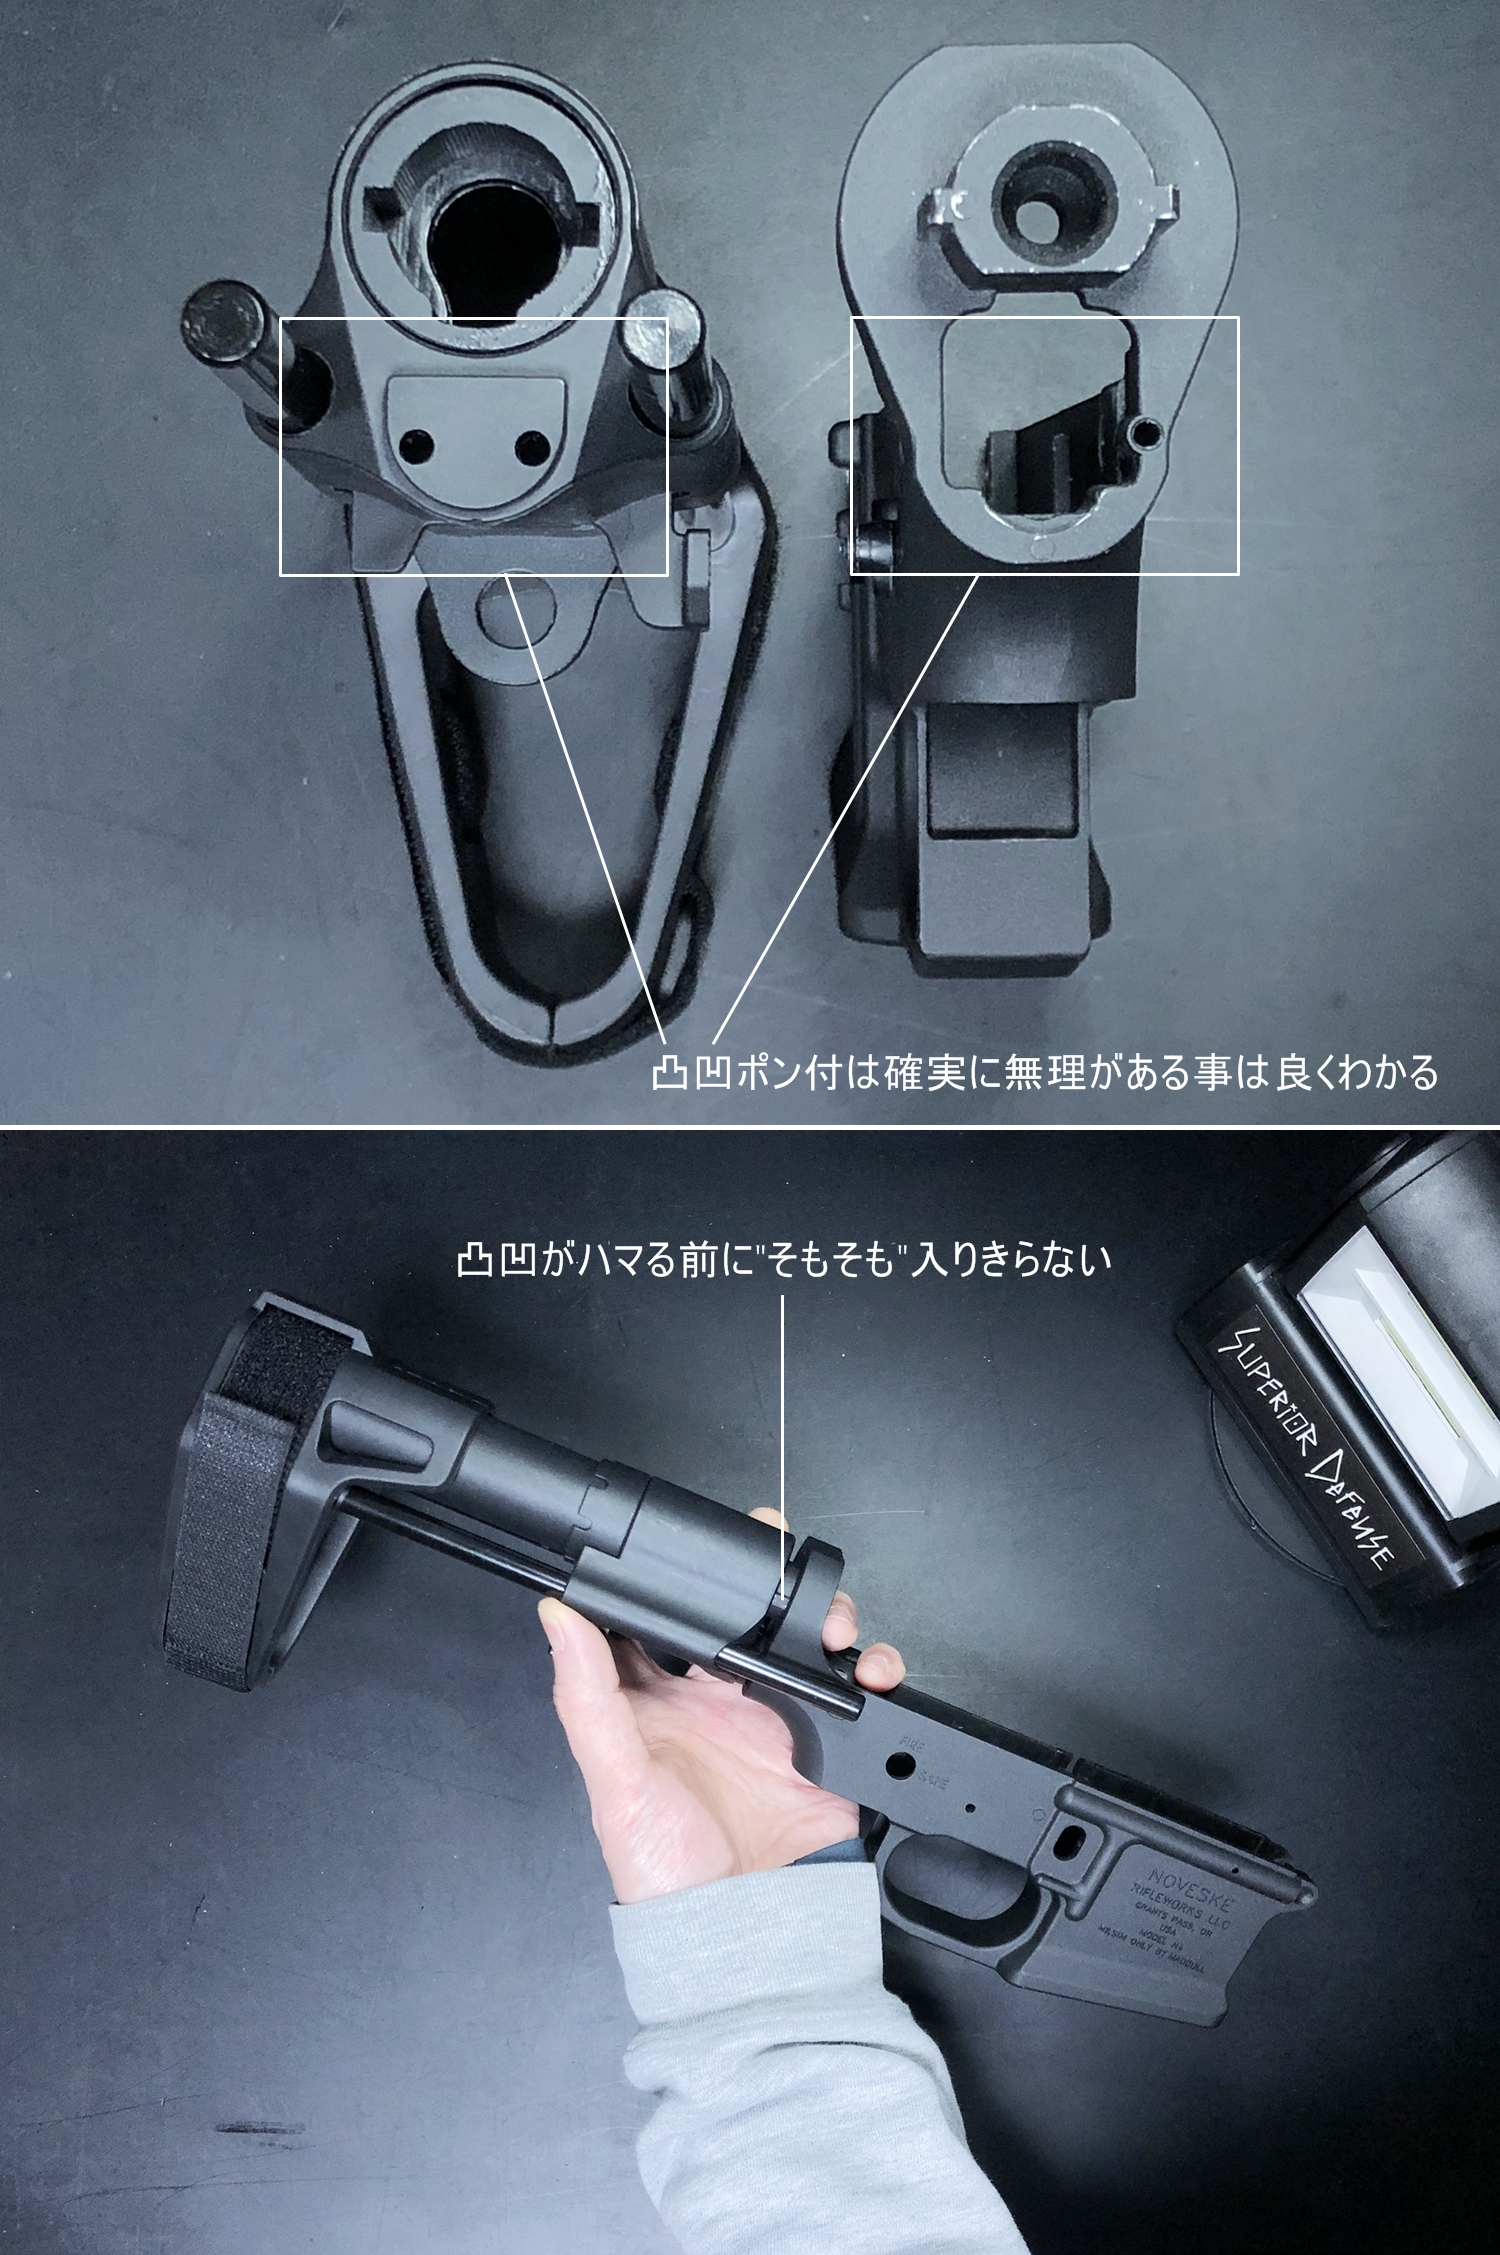 14 SB TACTICAL SB-PDW TYPE!! ちょっと気になって 購入~検証~DIY してみた!! STD電動ガン専用 M4 AR-15 スタビブレース バットストック & NOVESKE GEN3 MB専用 ポン付け ストック スリング プレート作製!!